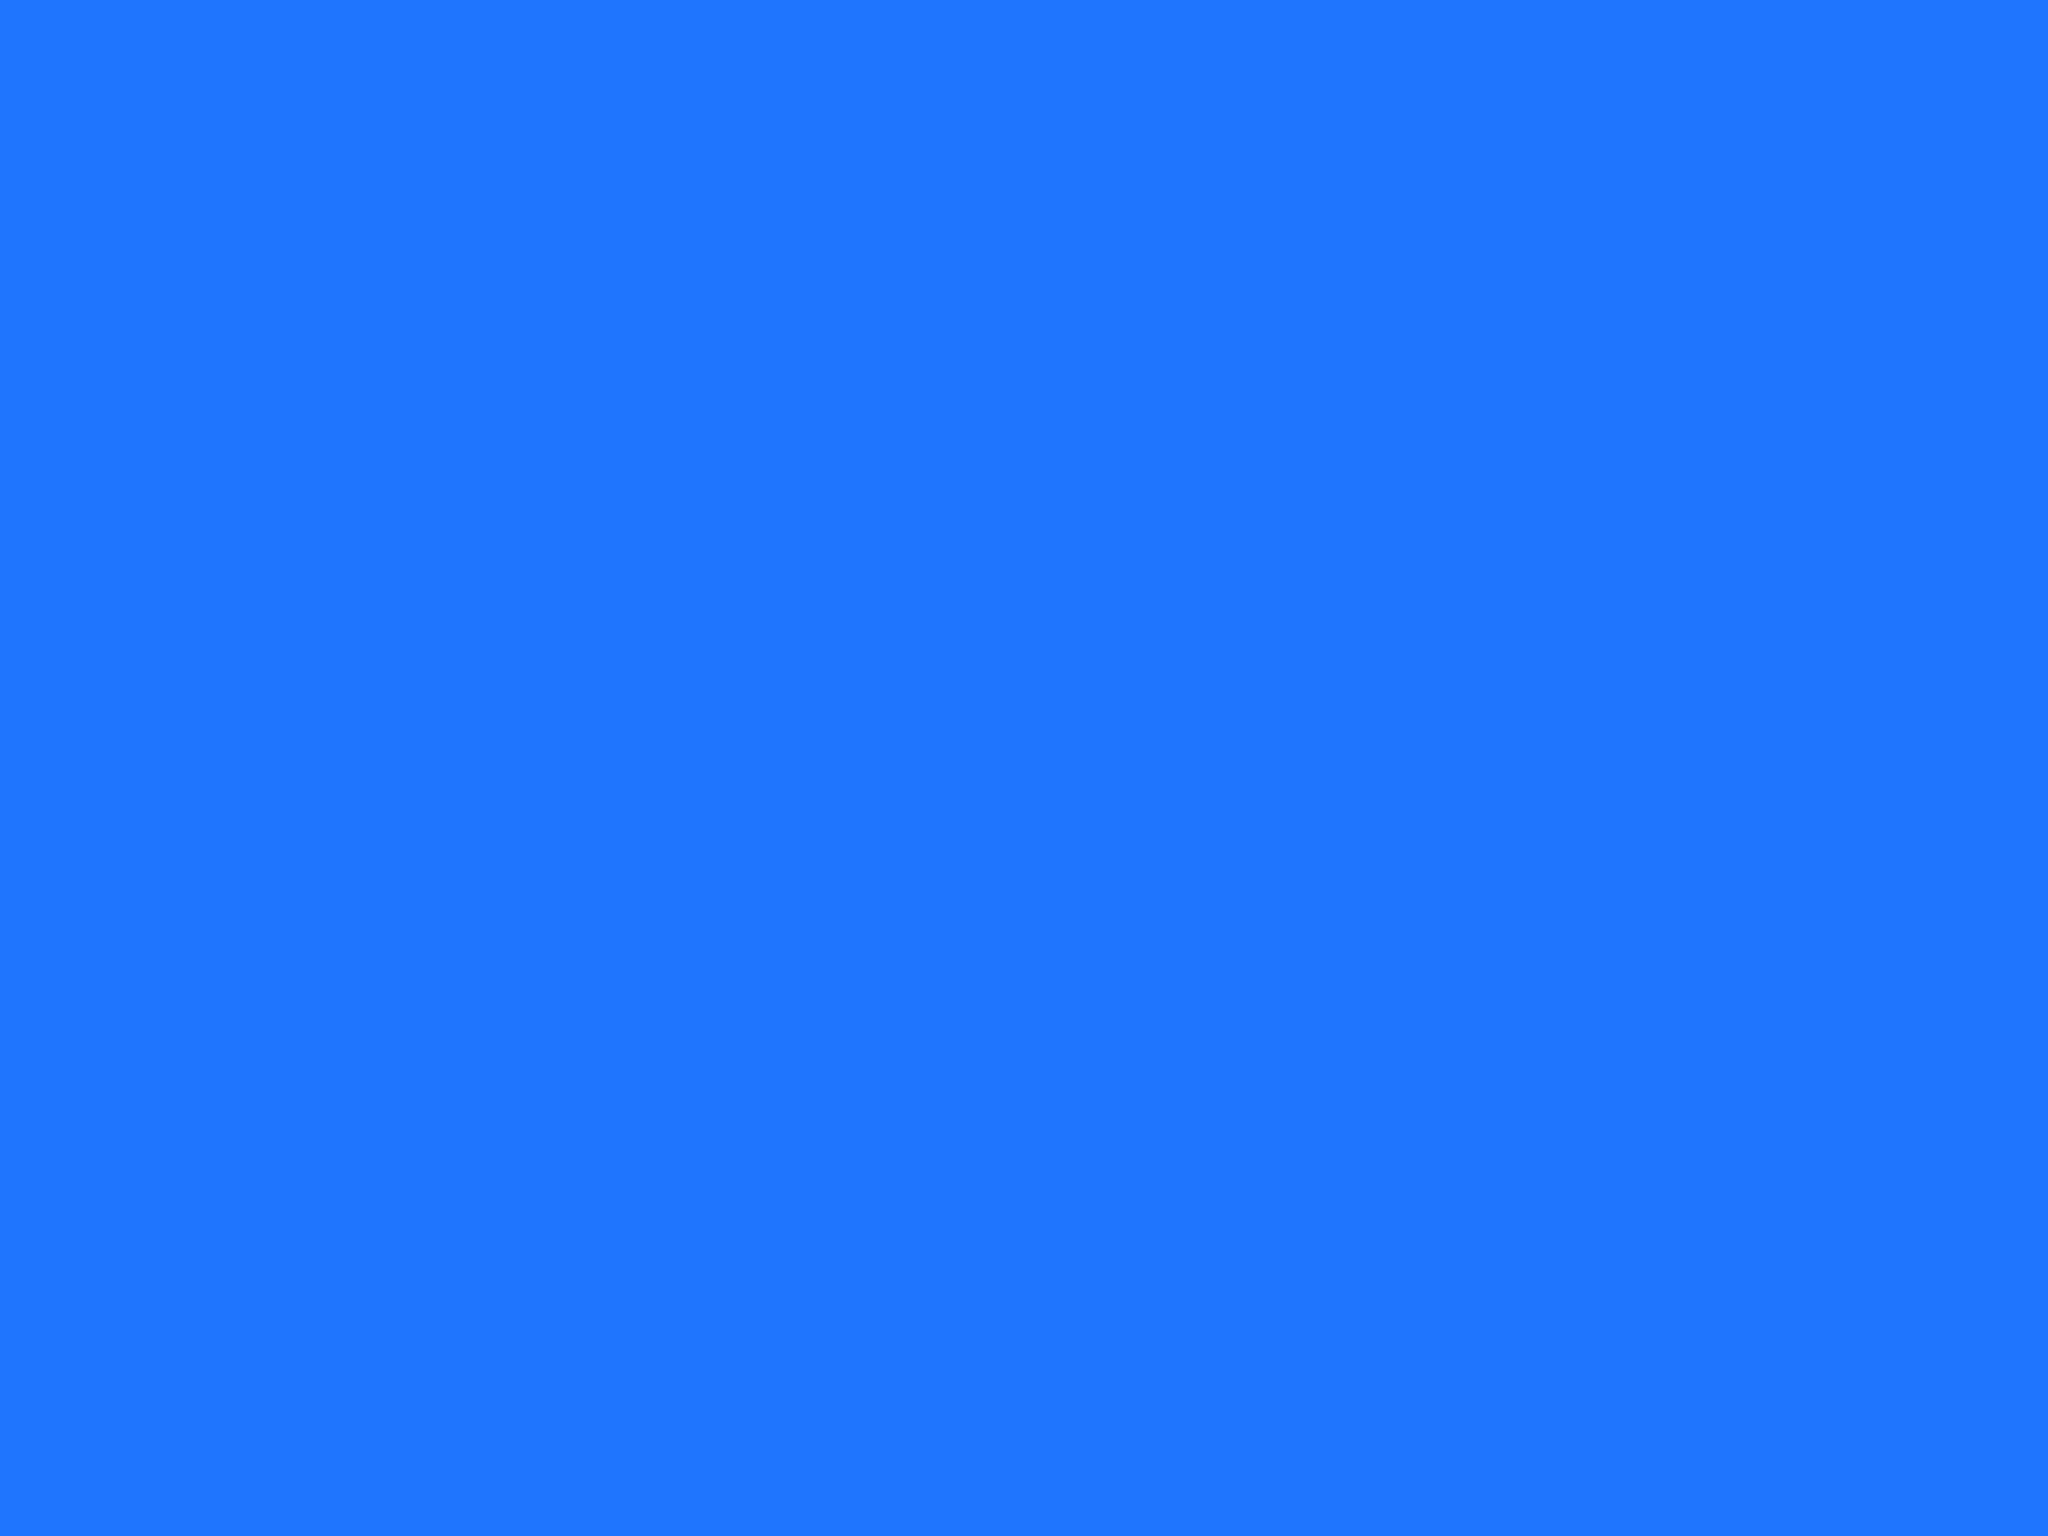 2048x1536 Blue Crayola Solid Color Background